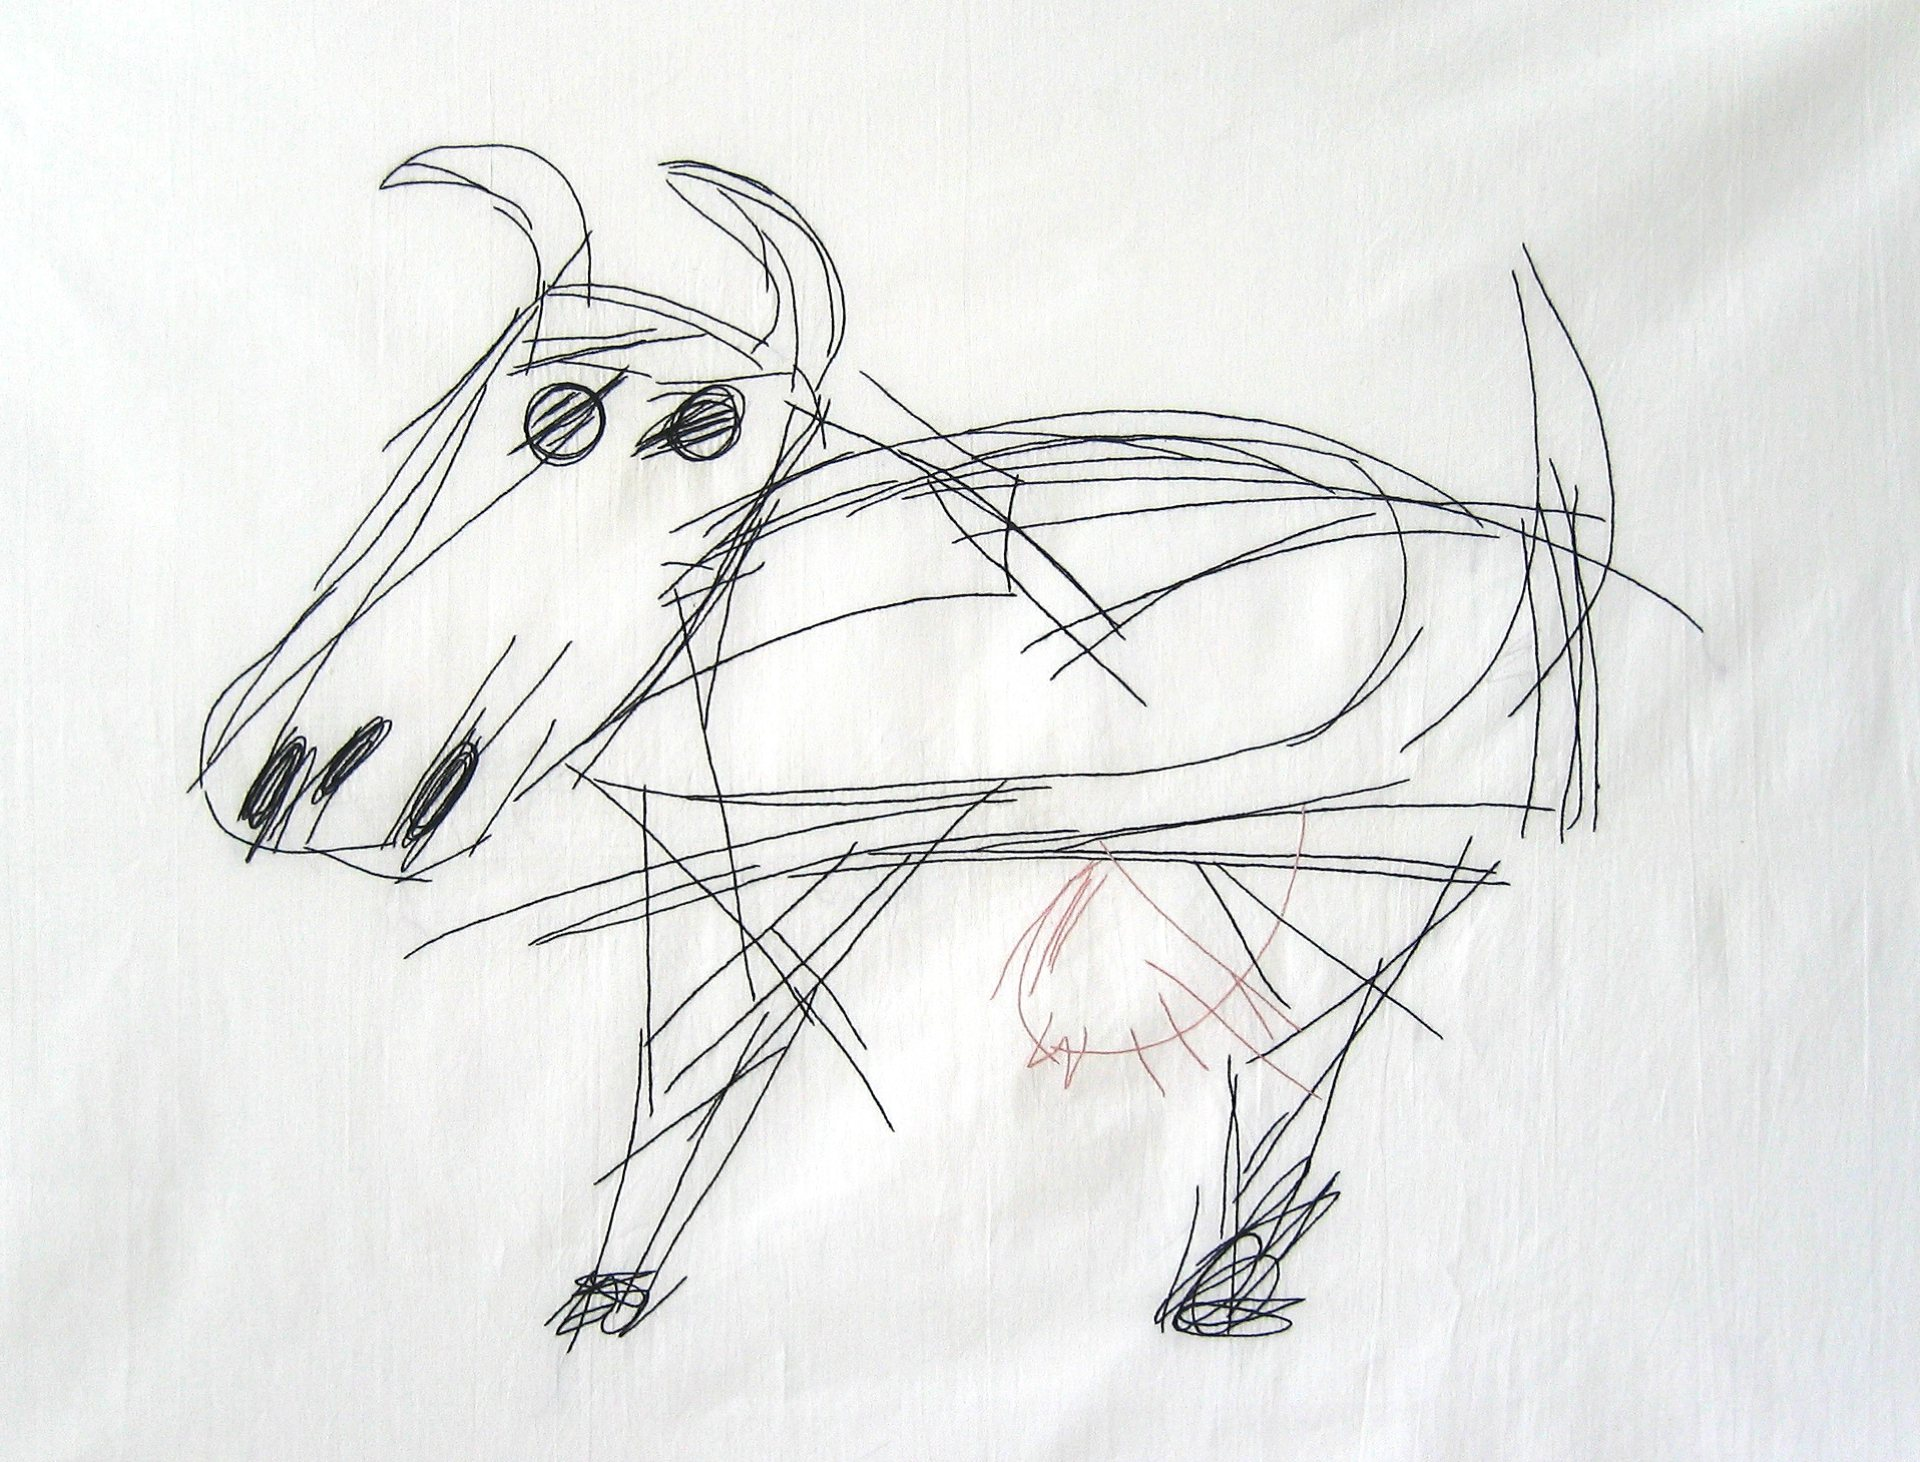 embroidery_garden of speech_cow